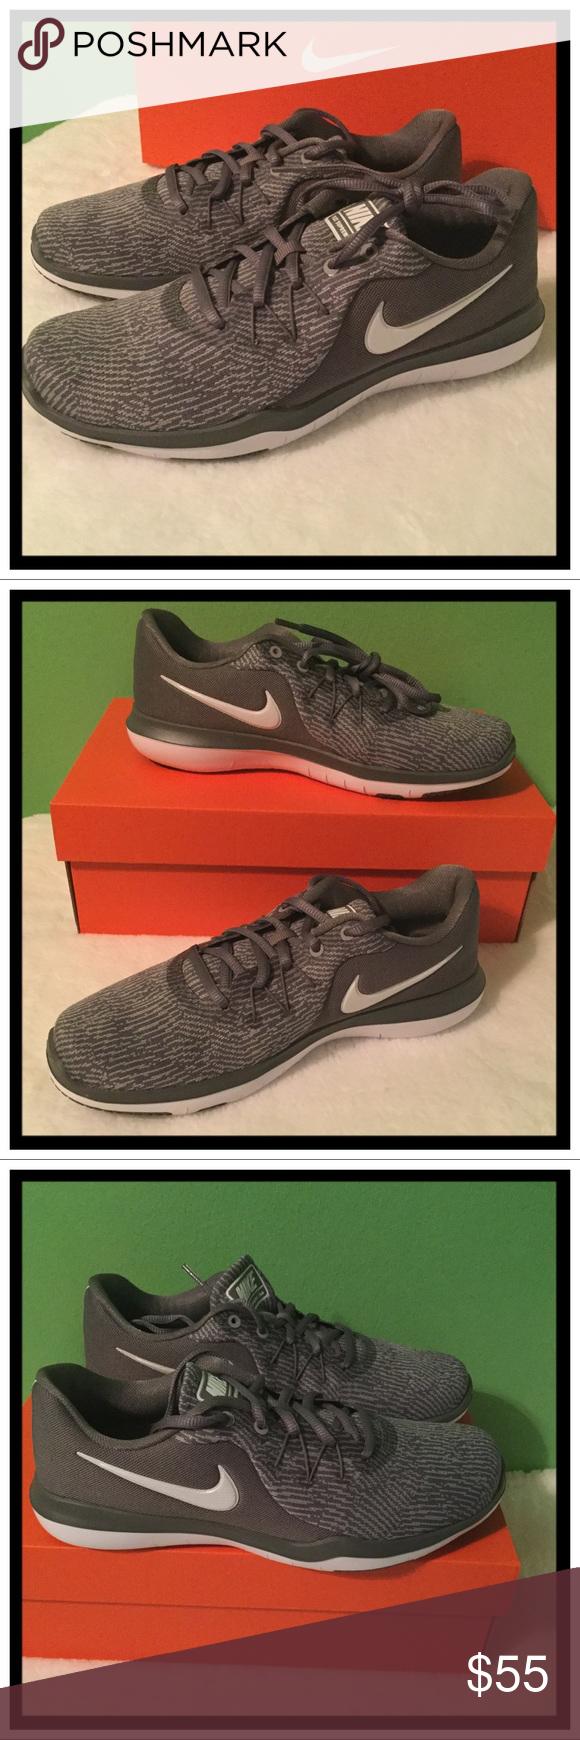 0f5ab3966a7 NWT Nike Flex Supreme TR6 Training Sneaker (Wide) 🌟NEW IN BOX🌟 Nike